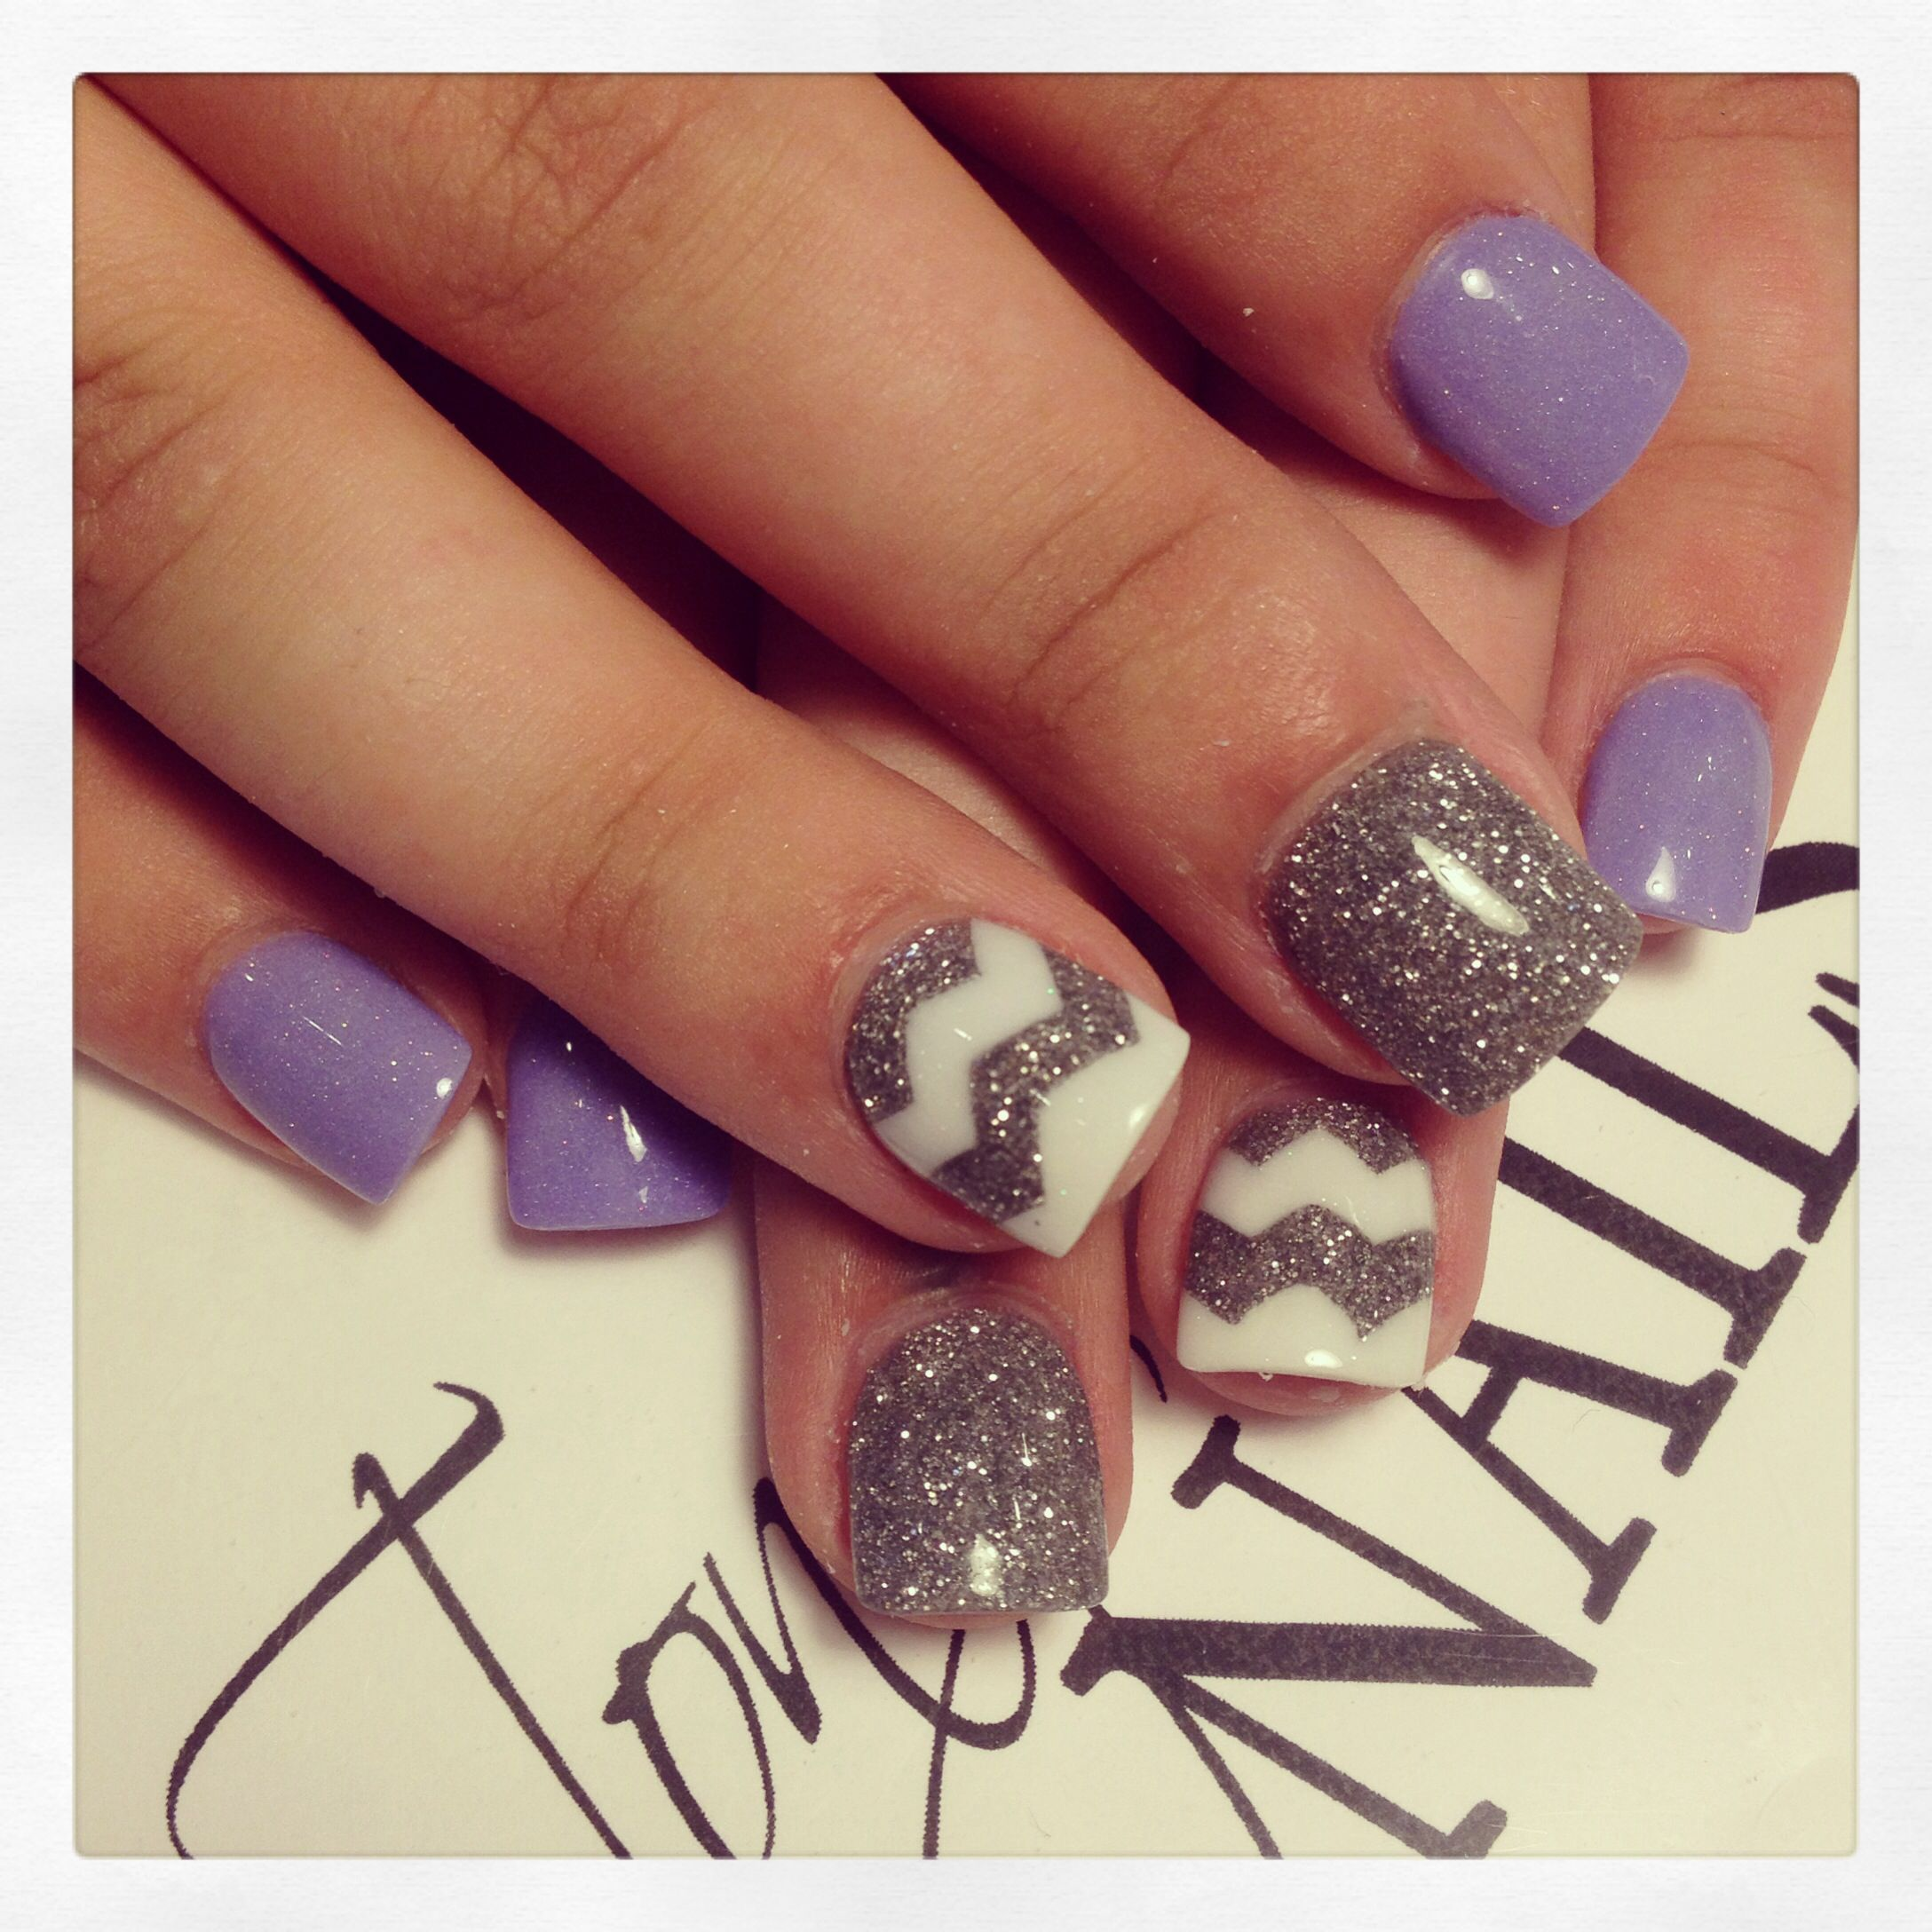 Tonys-nails.com All done by color solar powder   Nails   Pinterest ...